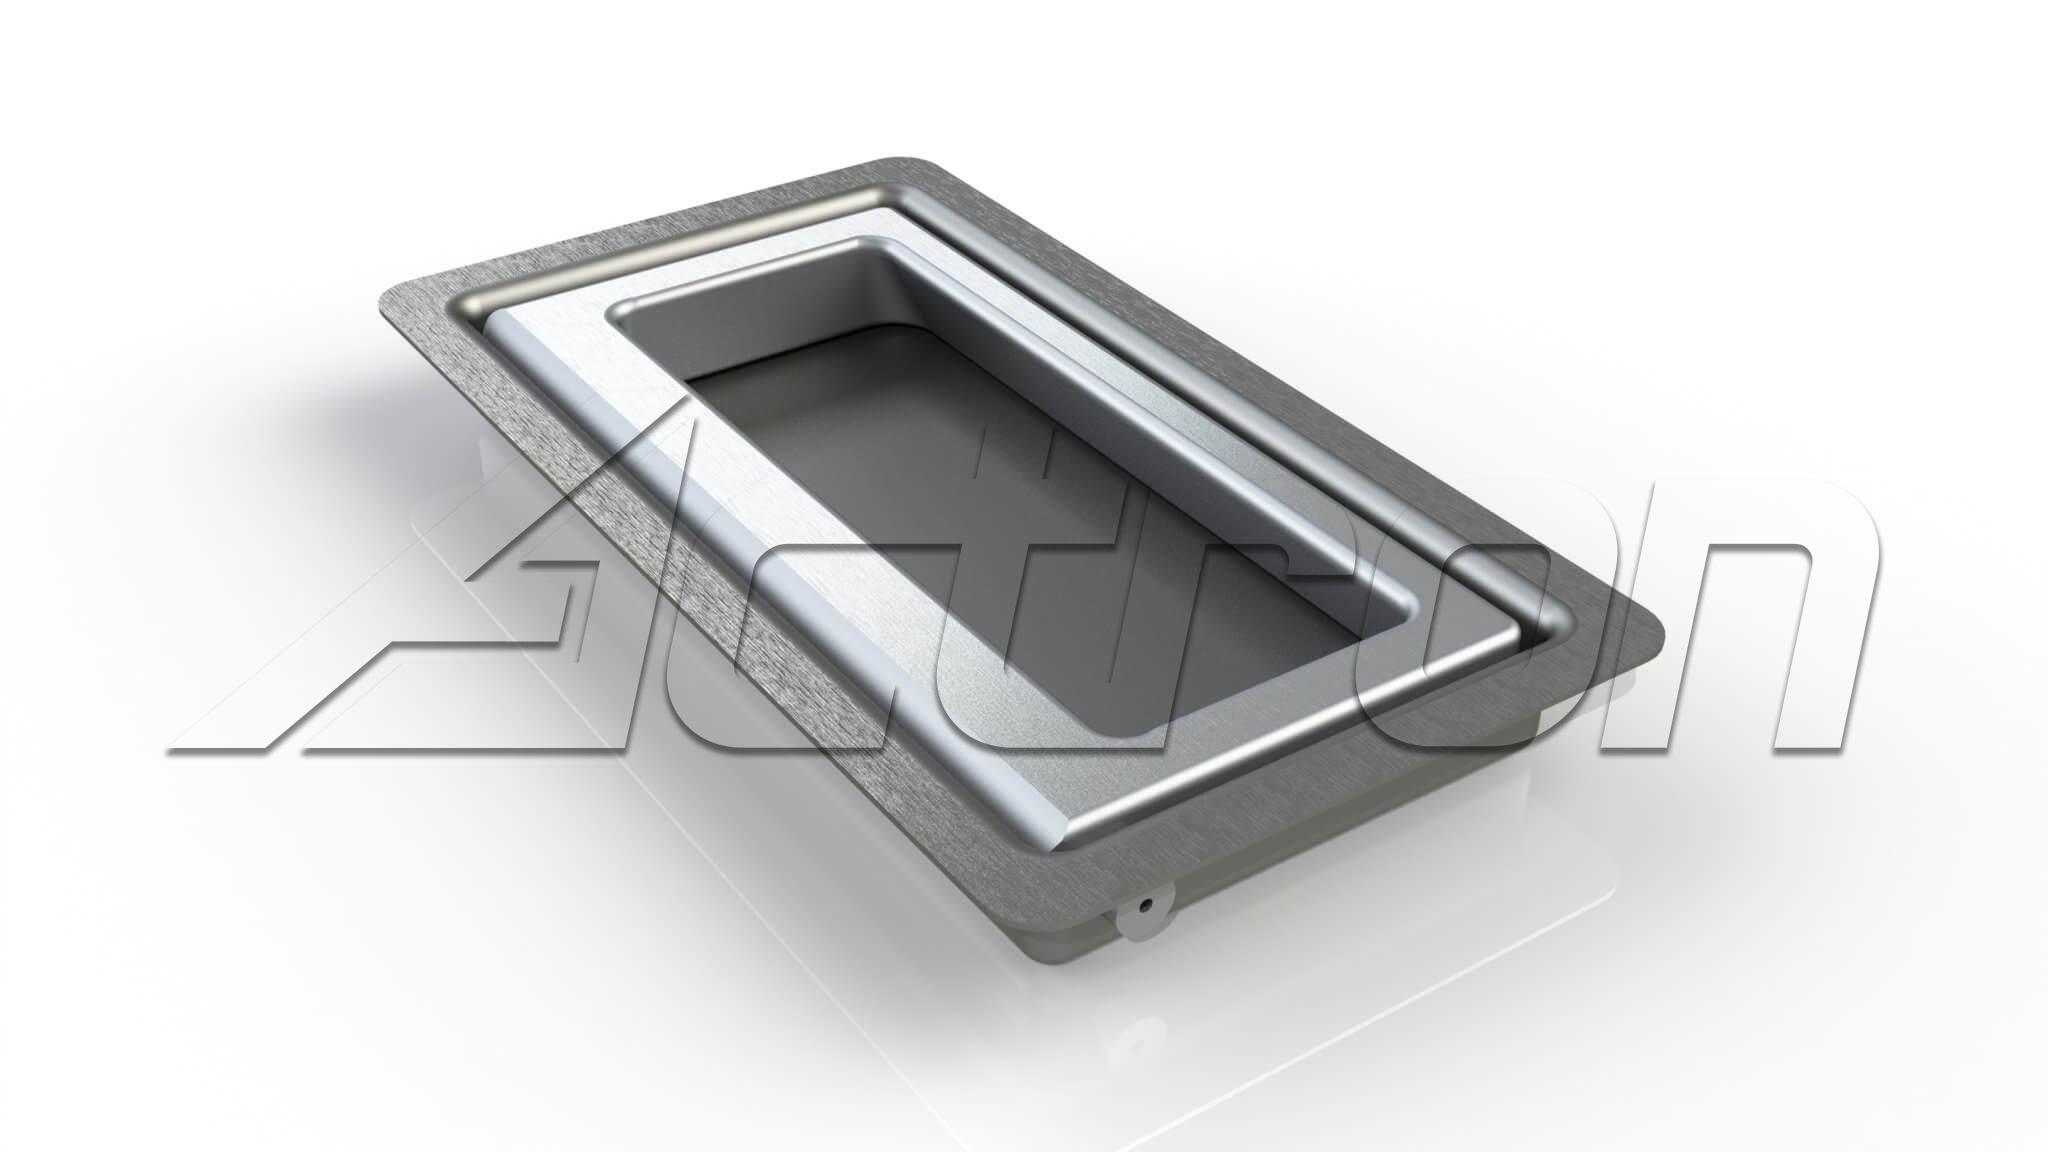 handle-assy-5178-a44001.jpg